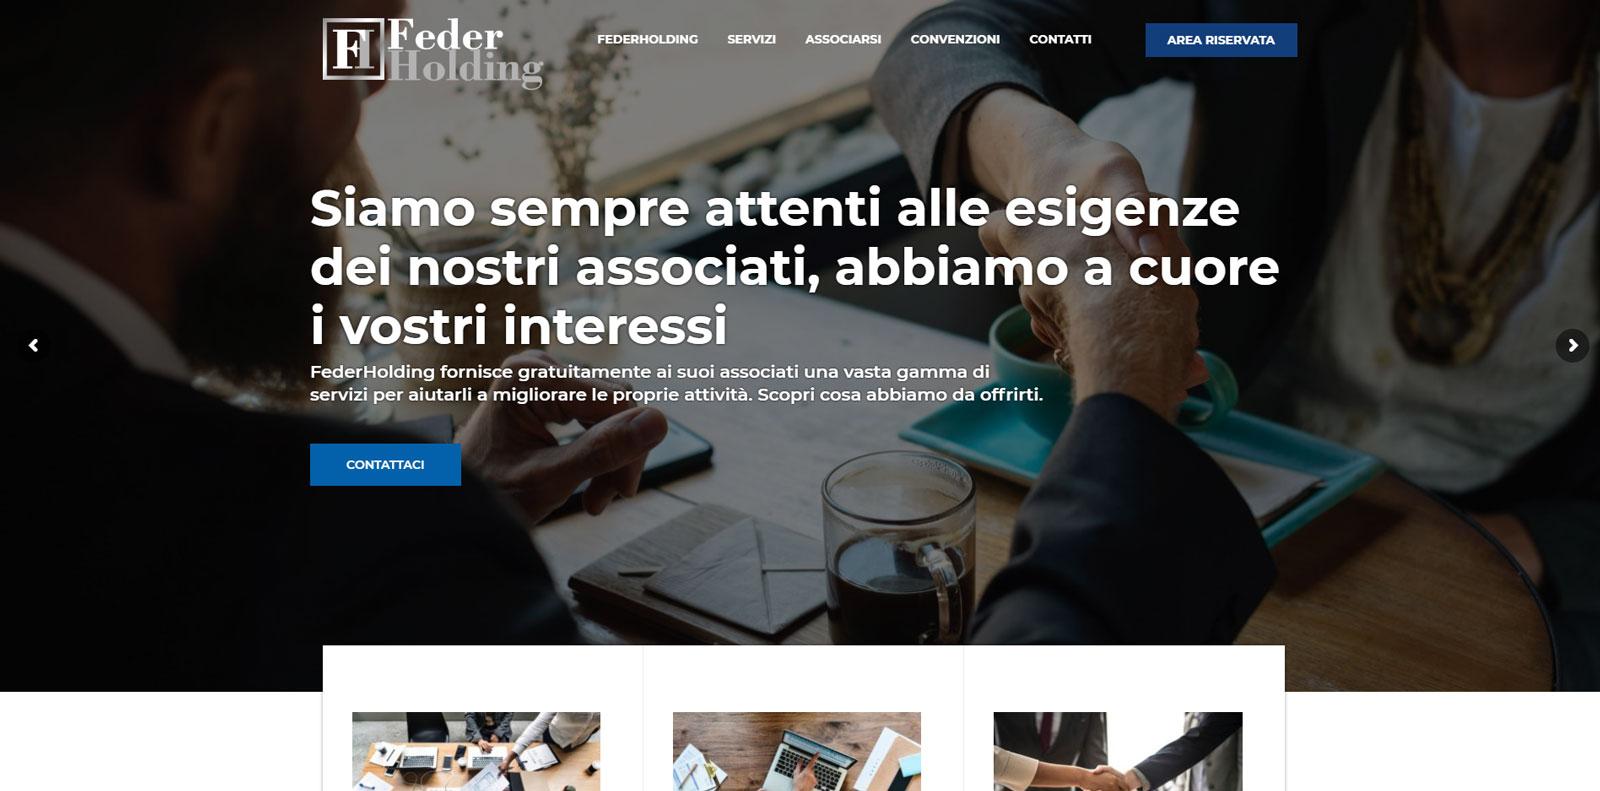 Feder Holding